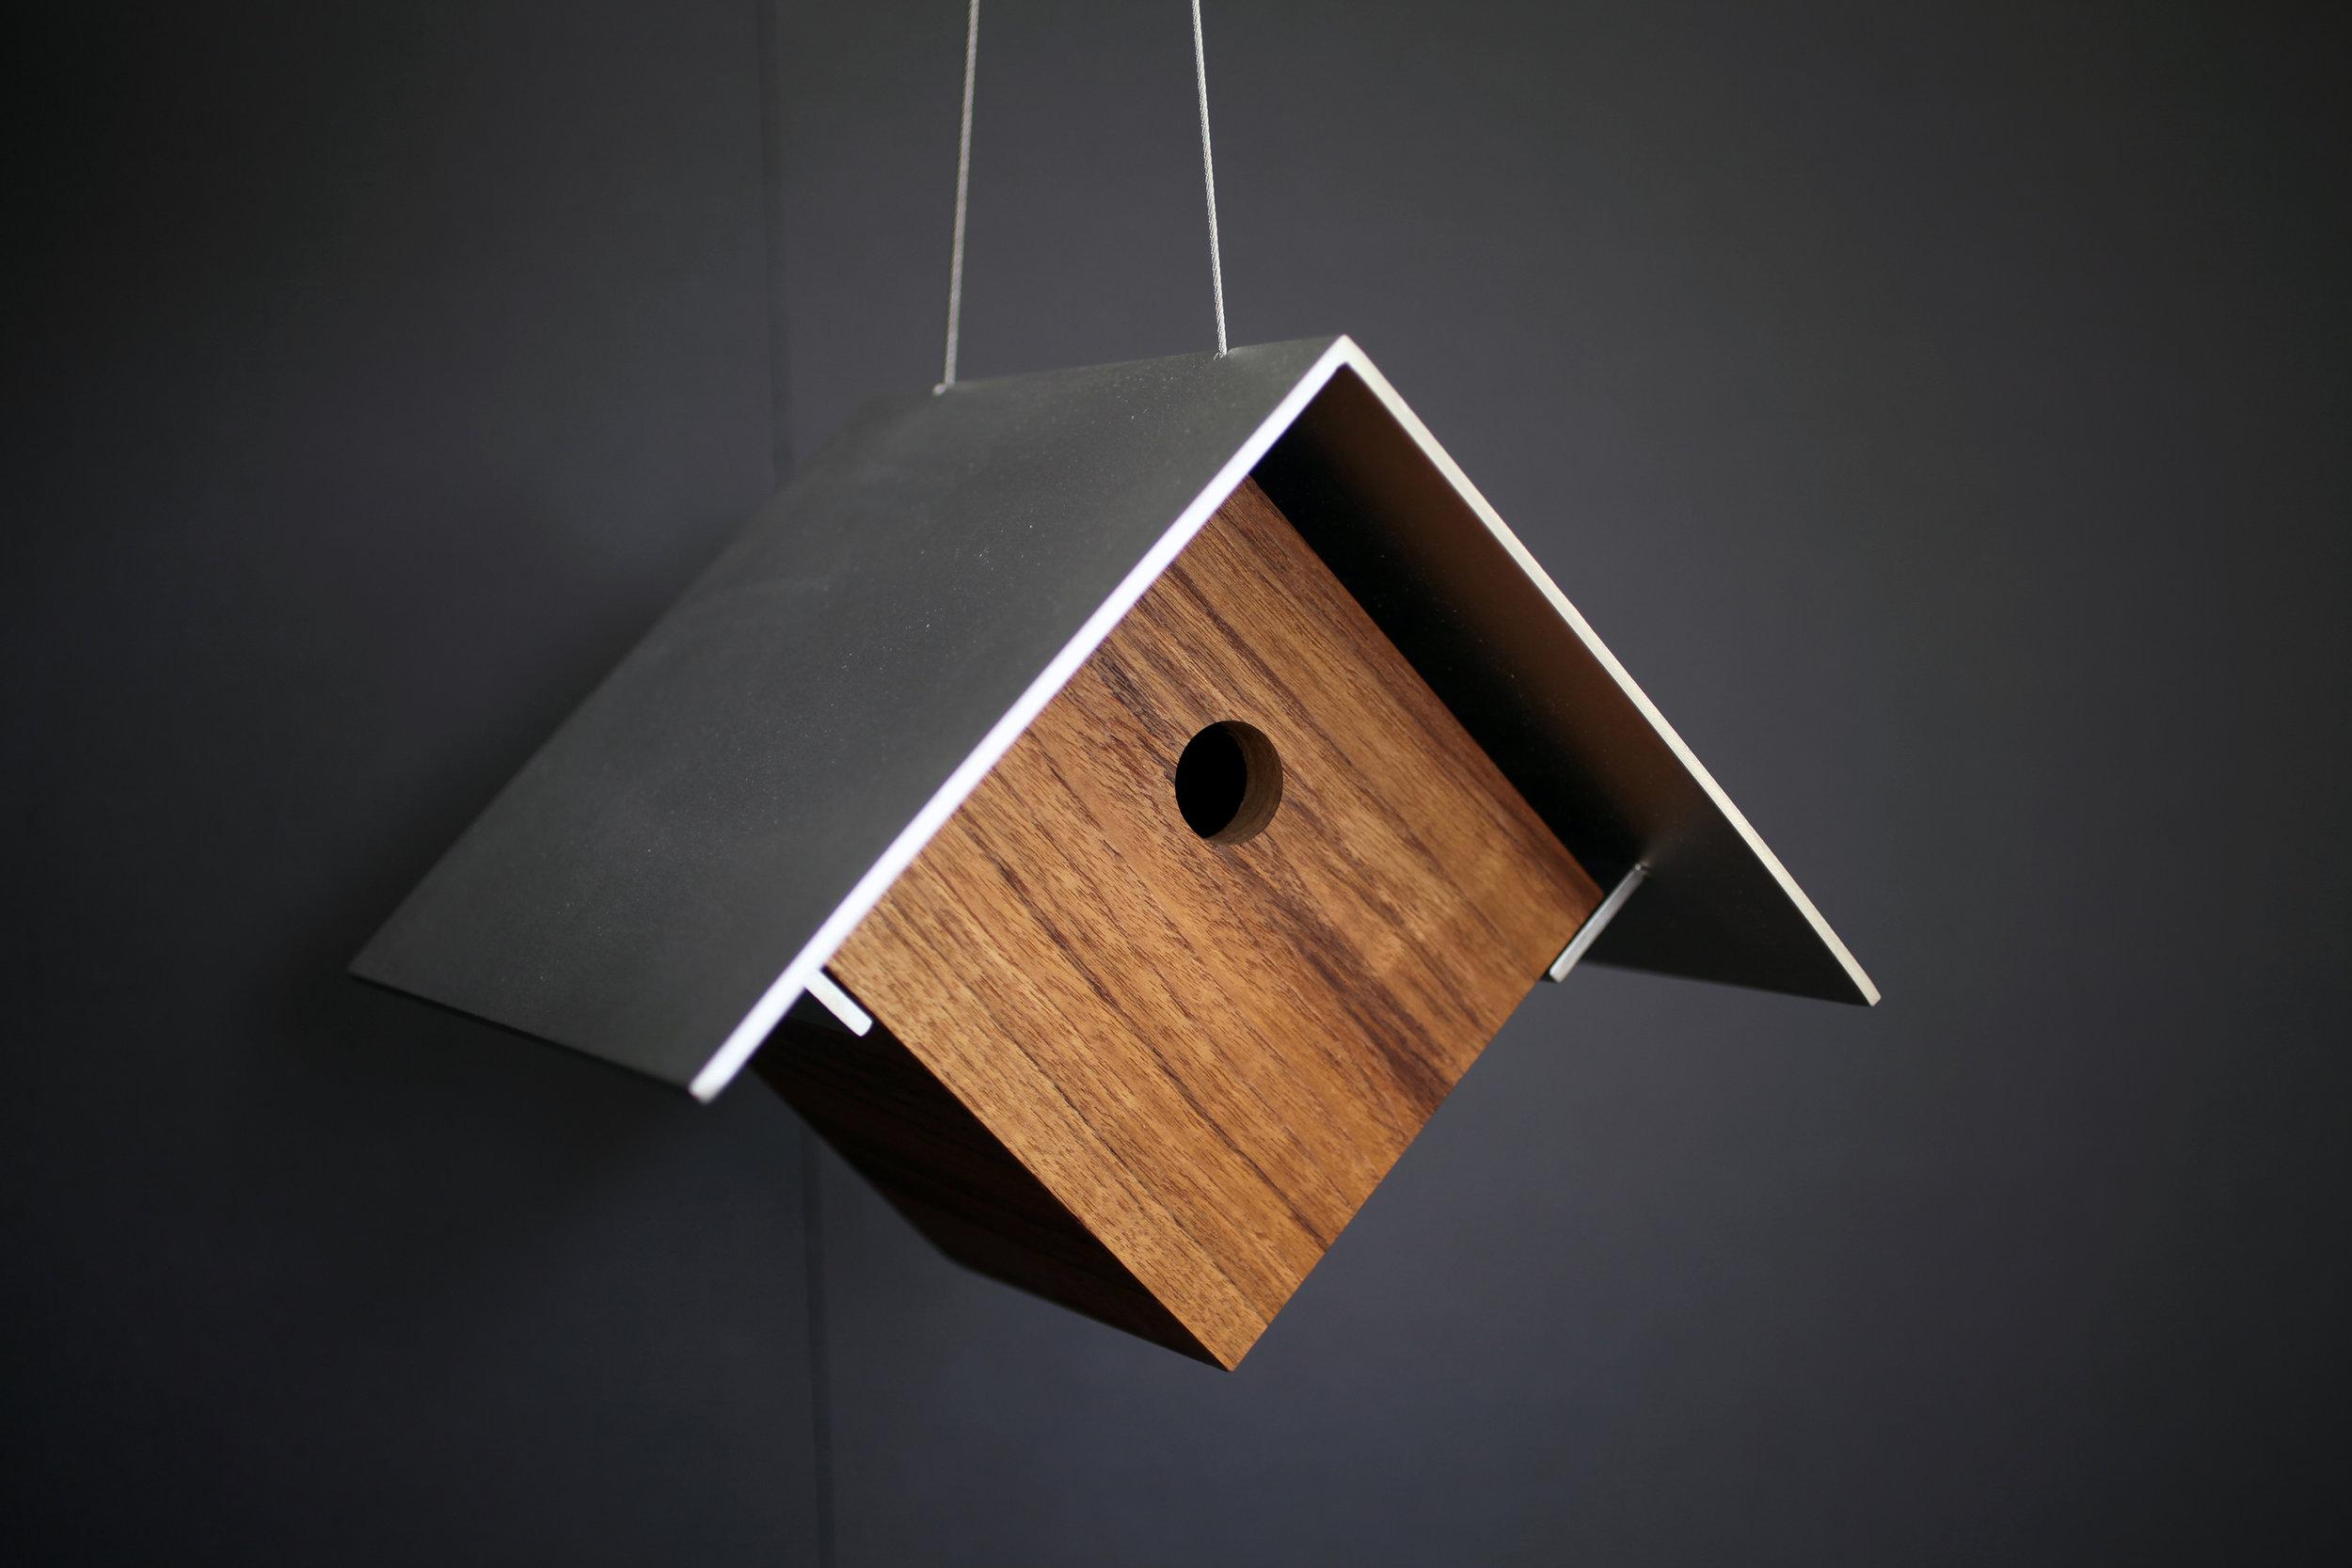 House for a Winter Wren